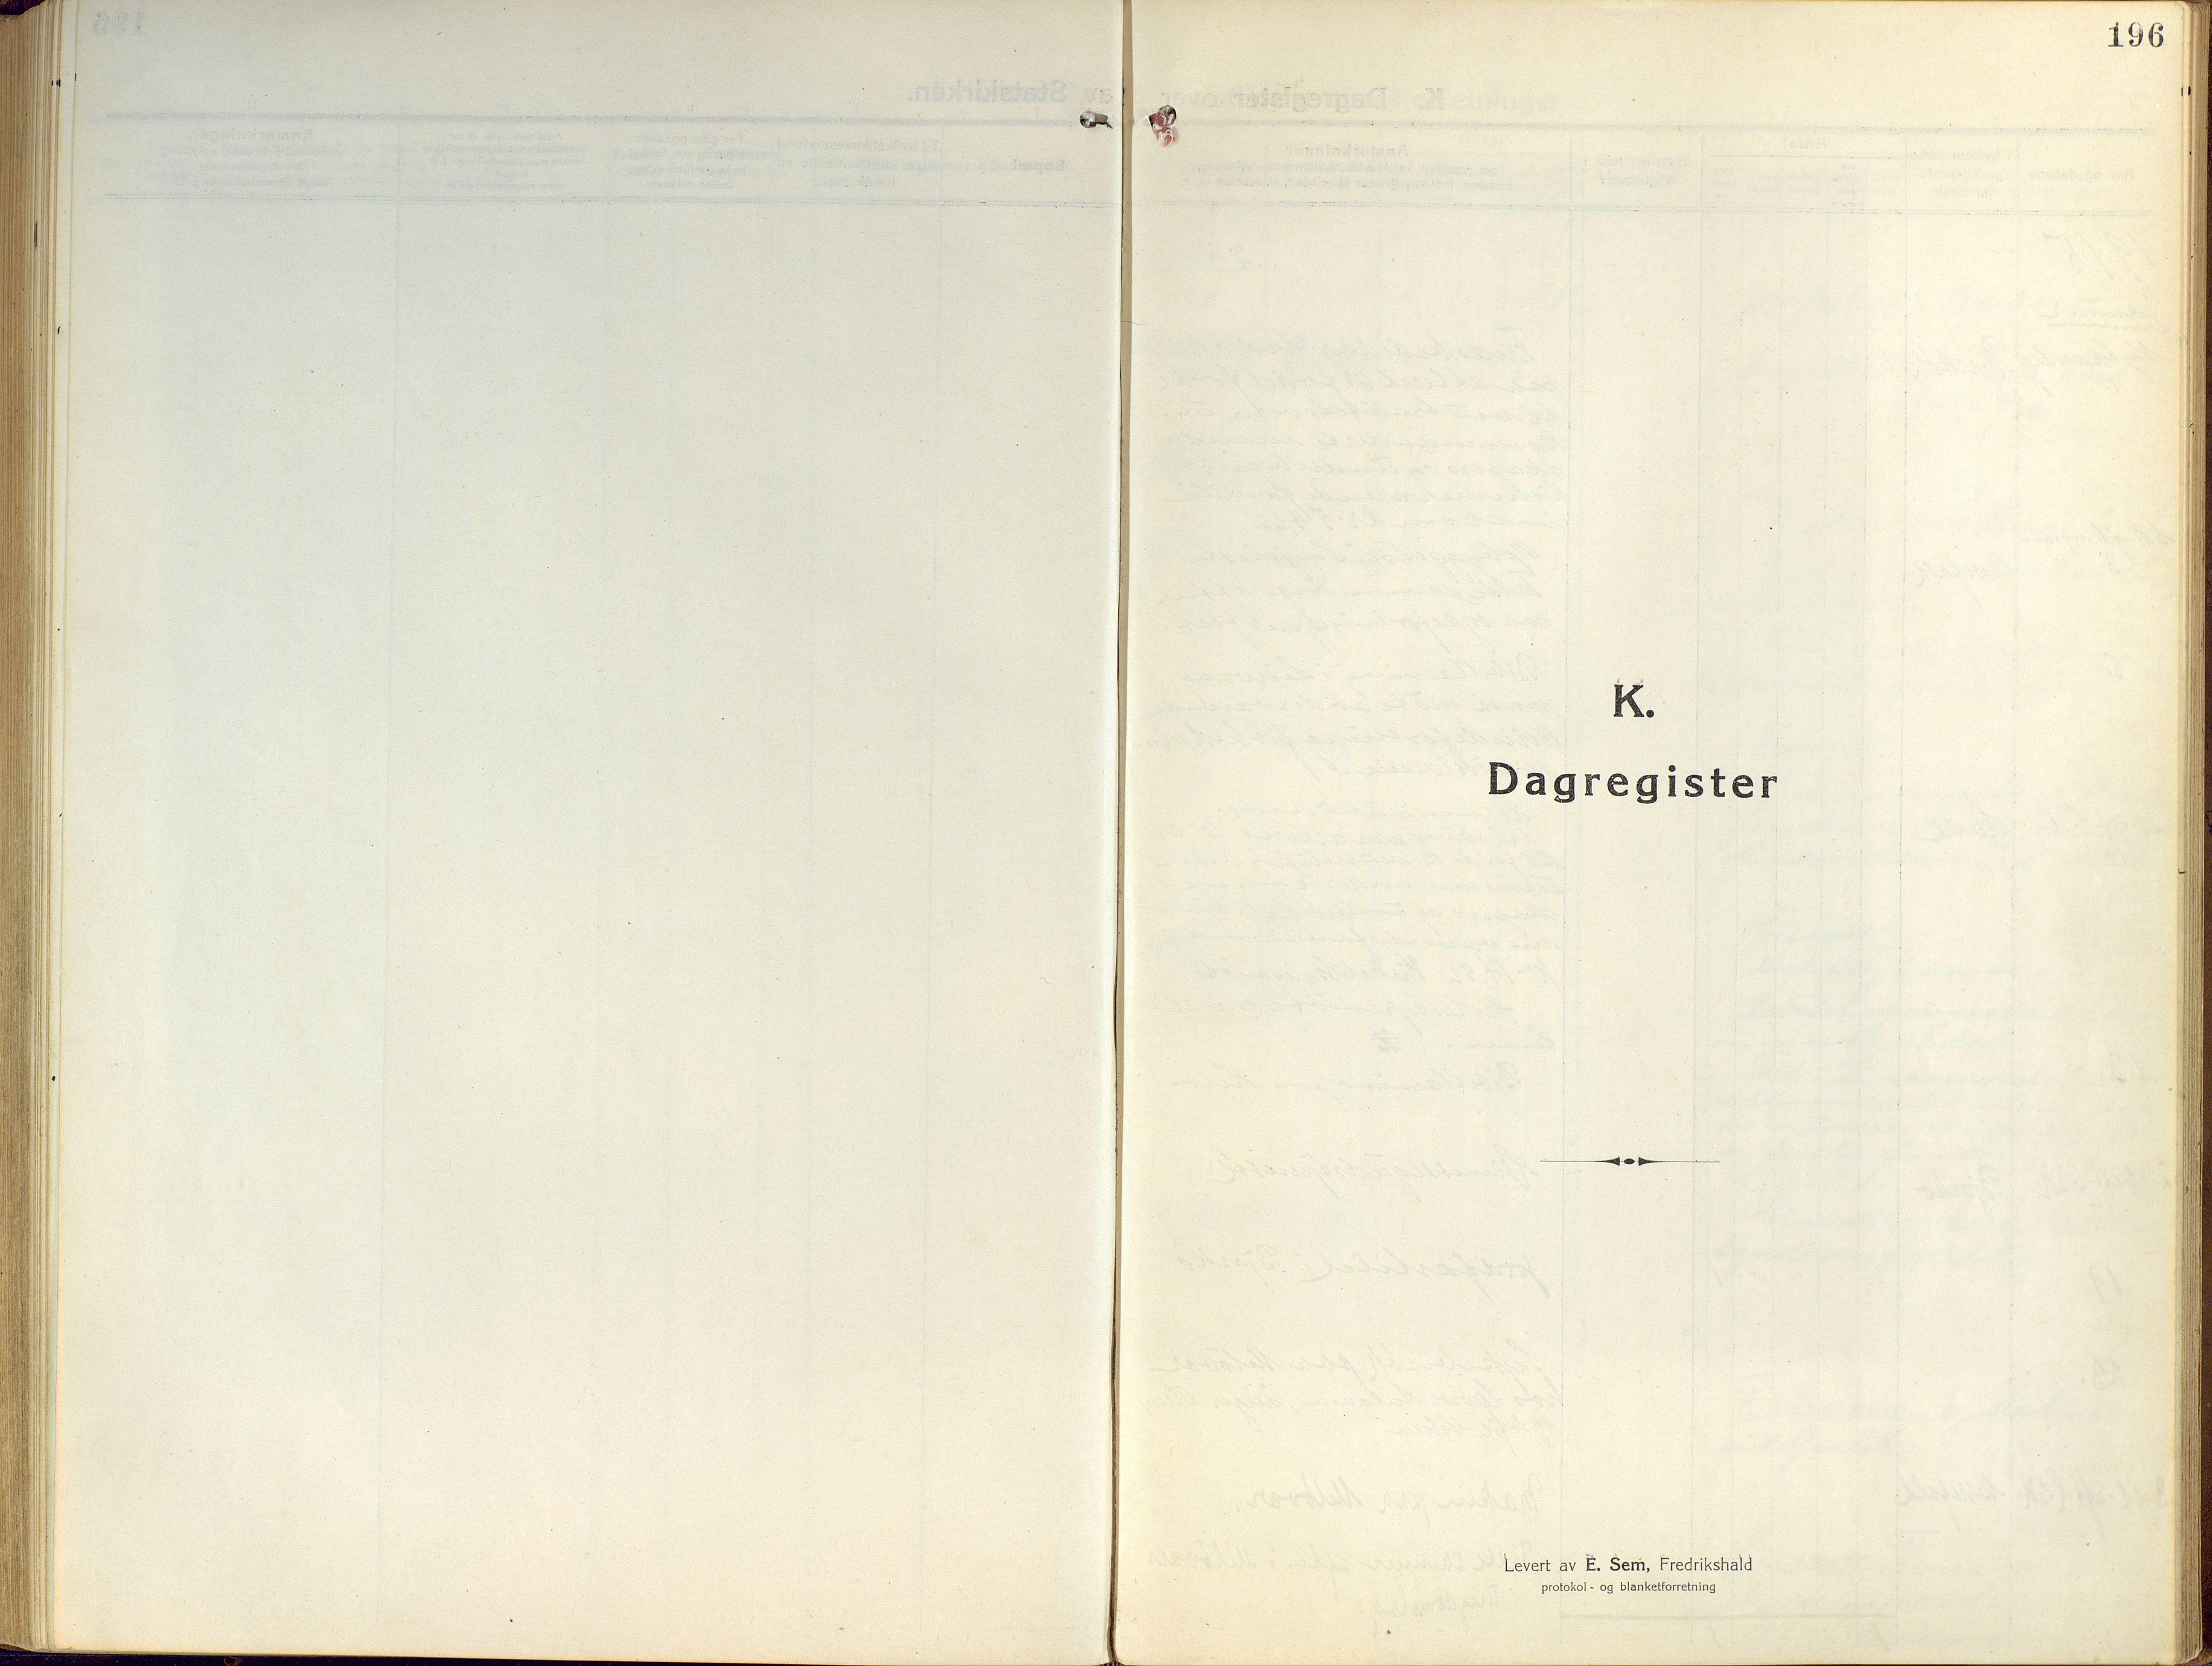 SATØ, Sand/Bjarkøy sokneprestkontor, I/Ia/Iaa/L0006kirke: Ministerialbok nr. 6, 1915-1929, s. 196